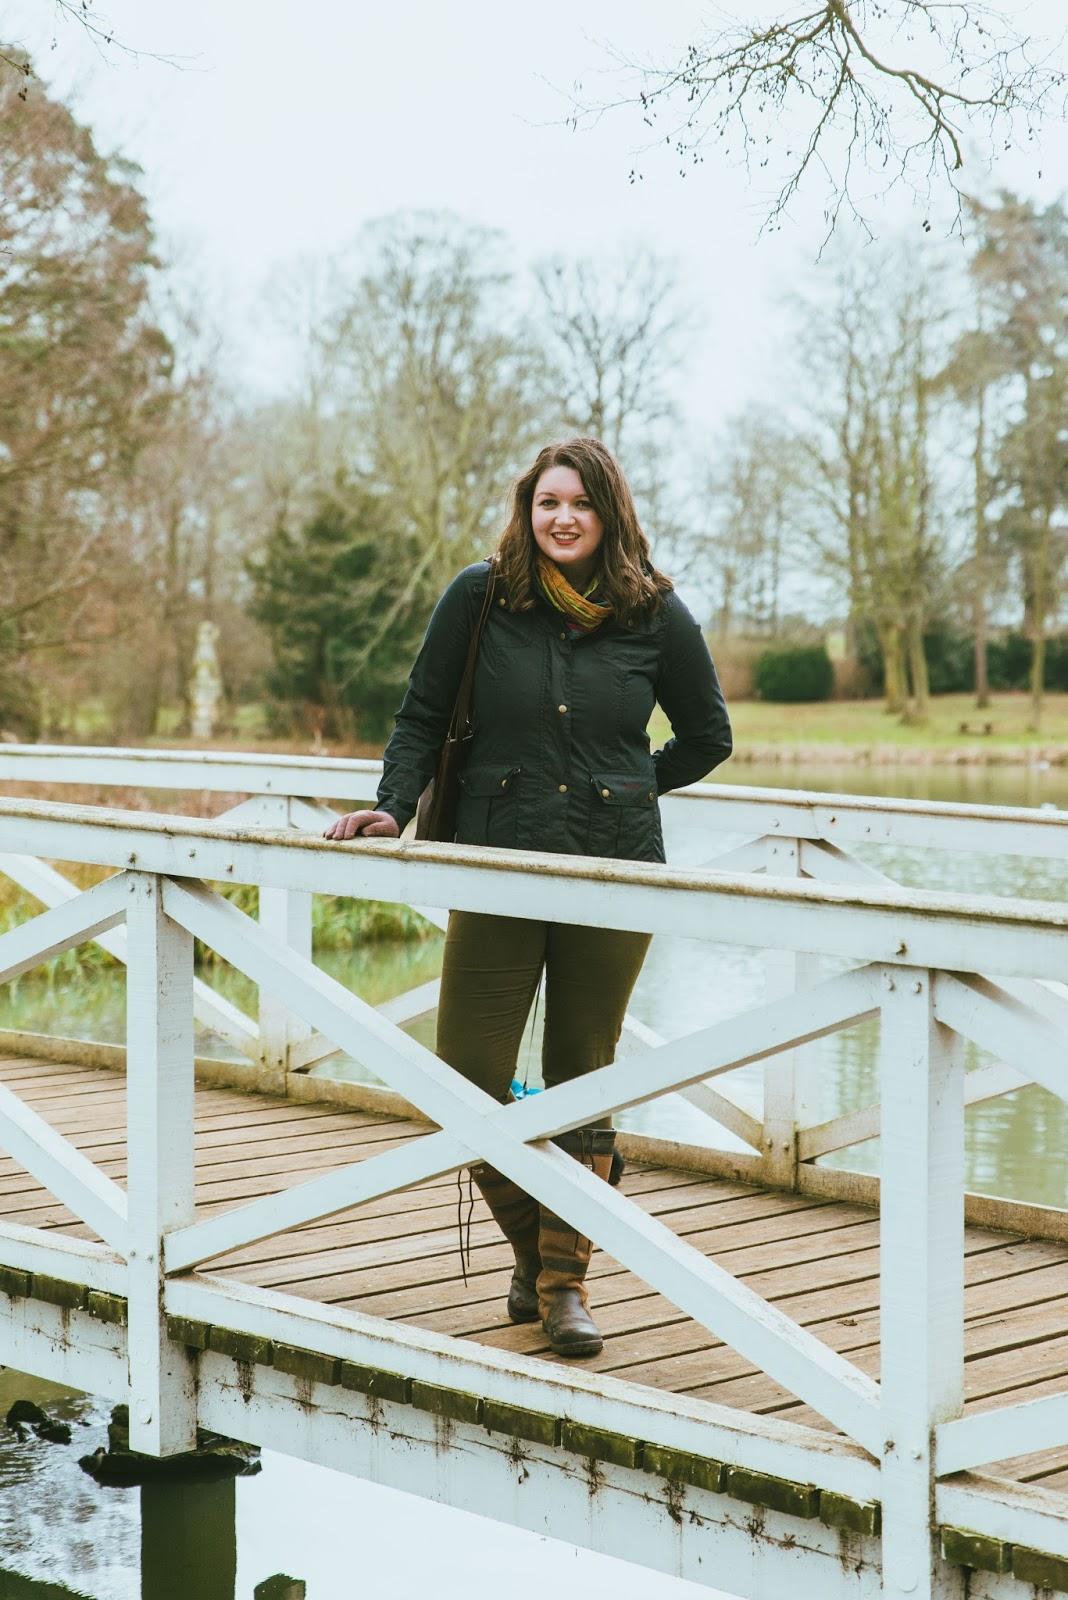 stowe gardens liquid grain liquidgrain dachshund walk palladian bridge